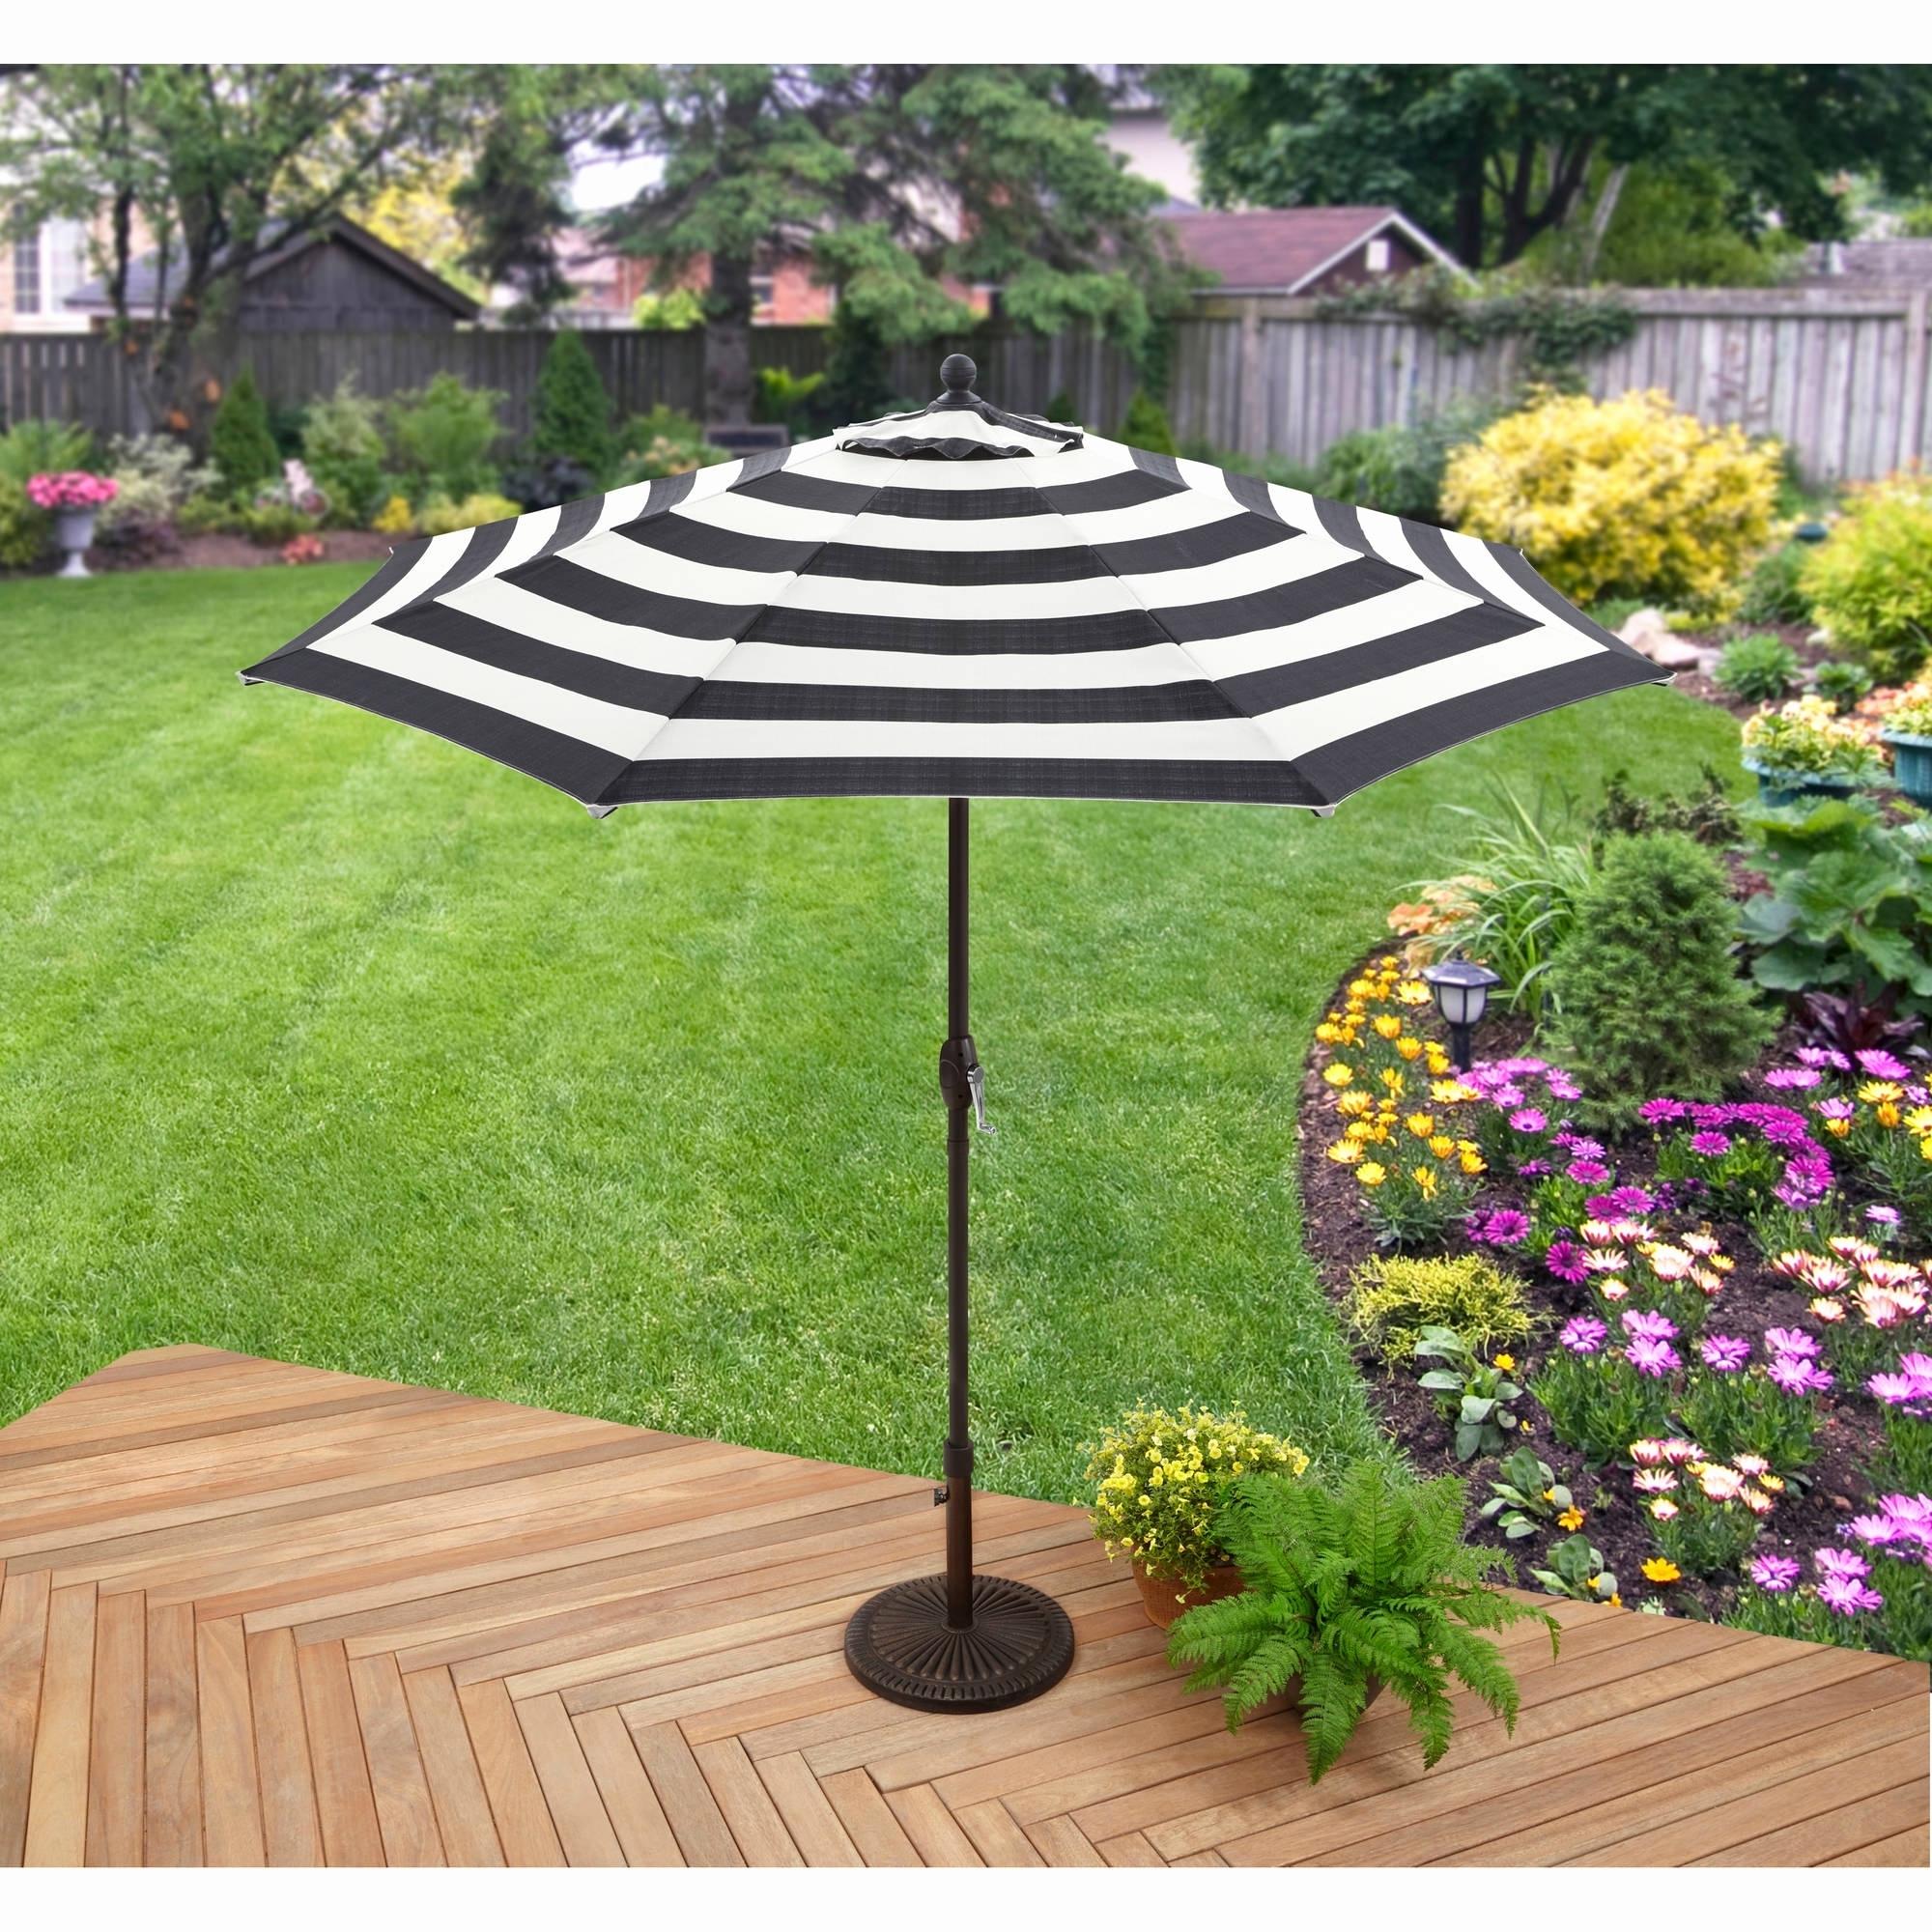 Black And White Striped Umbrella Walmart (View 13 of 20)